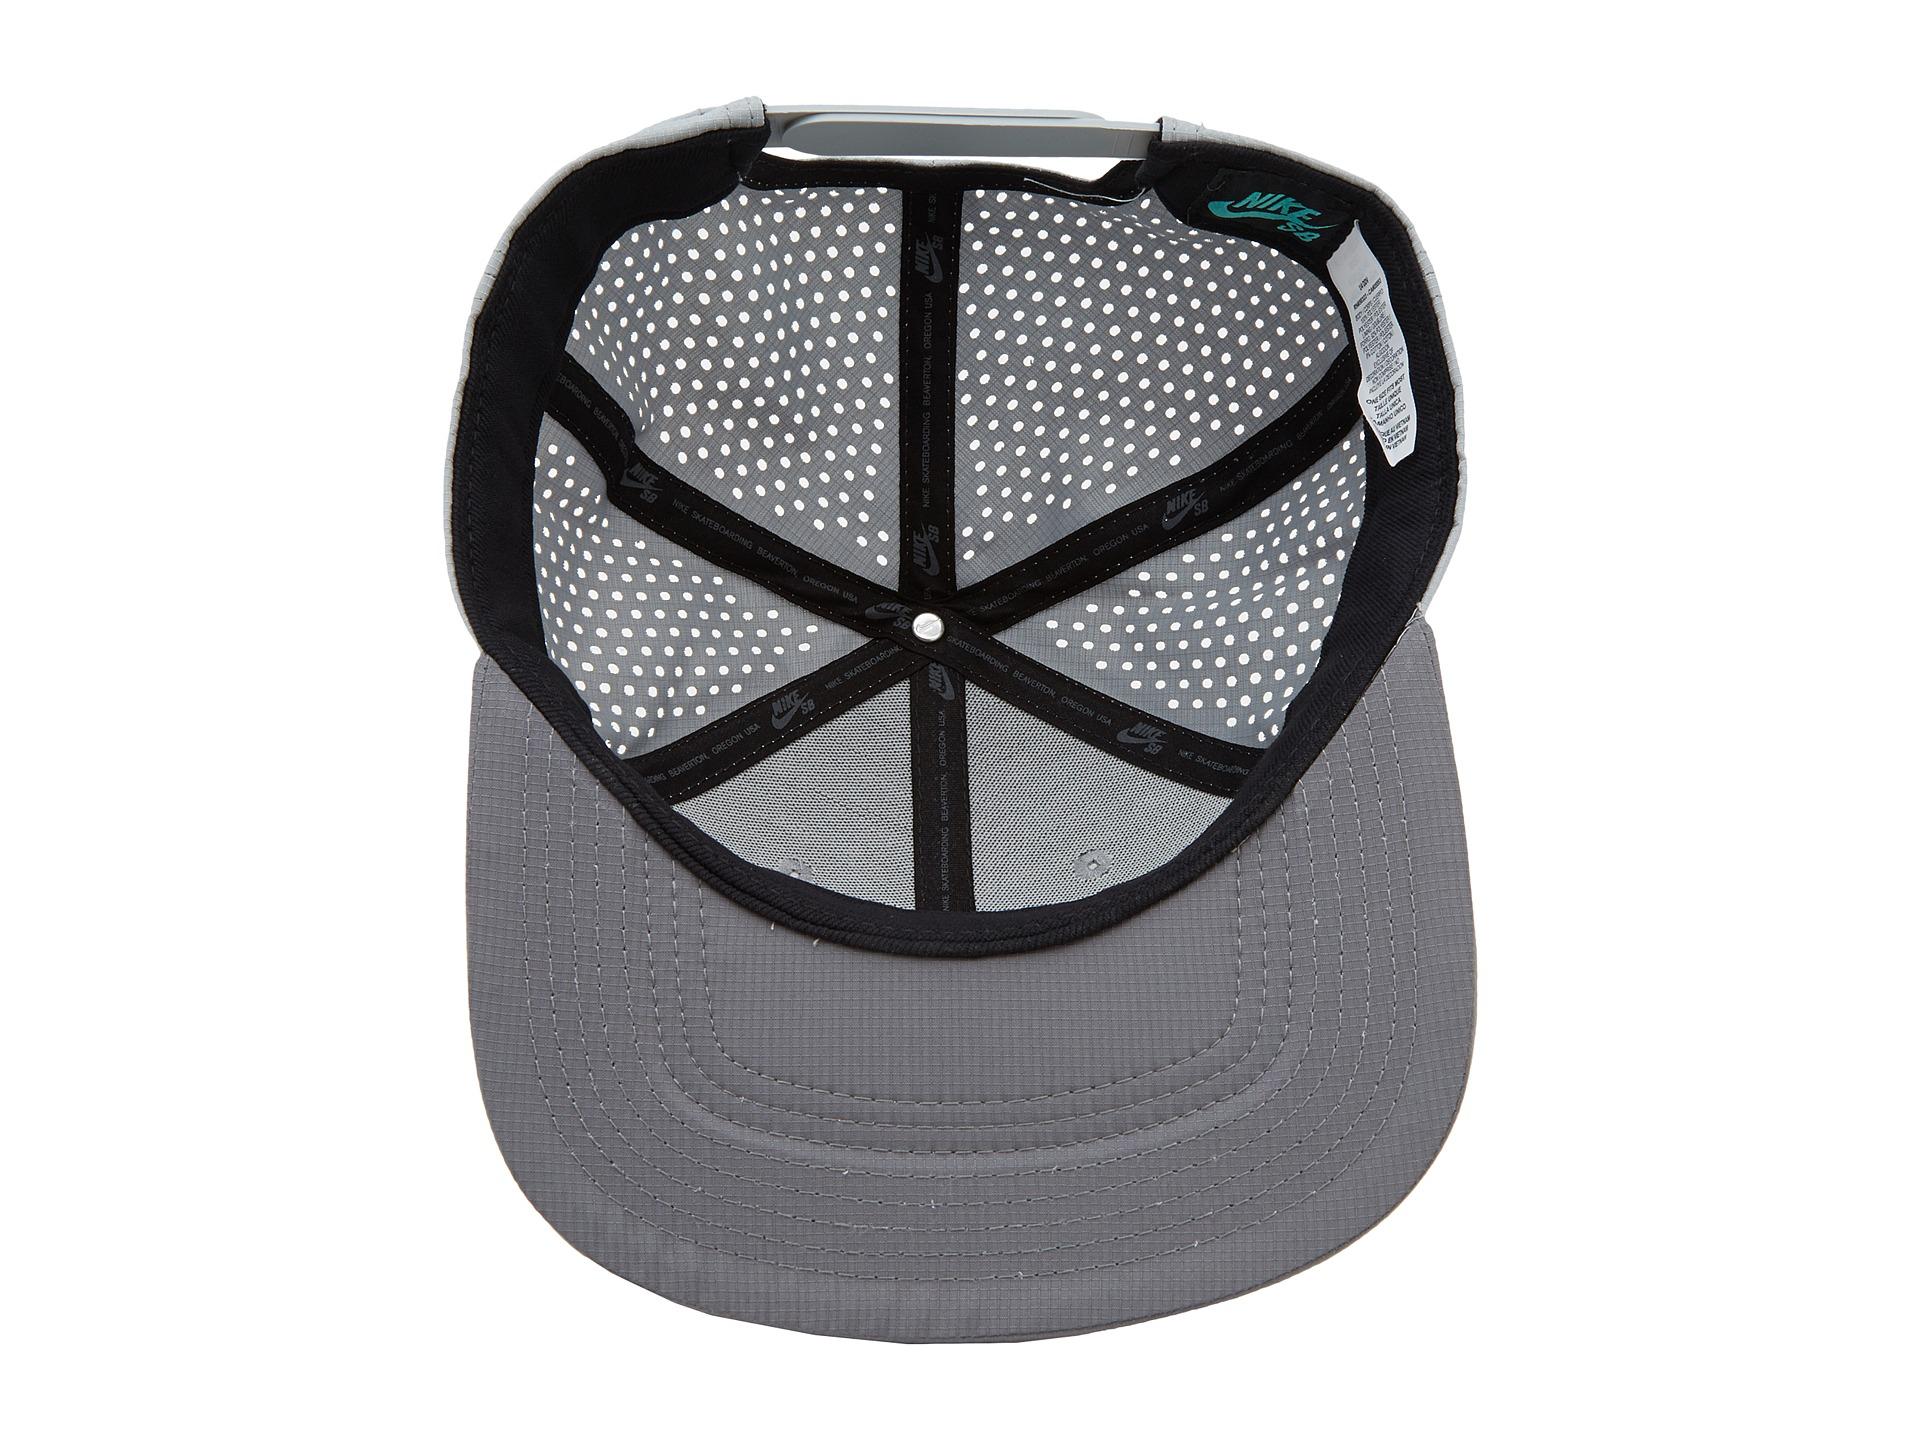 ea6dcbddaf7 Lyst - Nike Performance Trucker Hat in Gray for Men